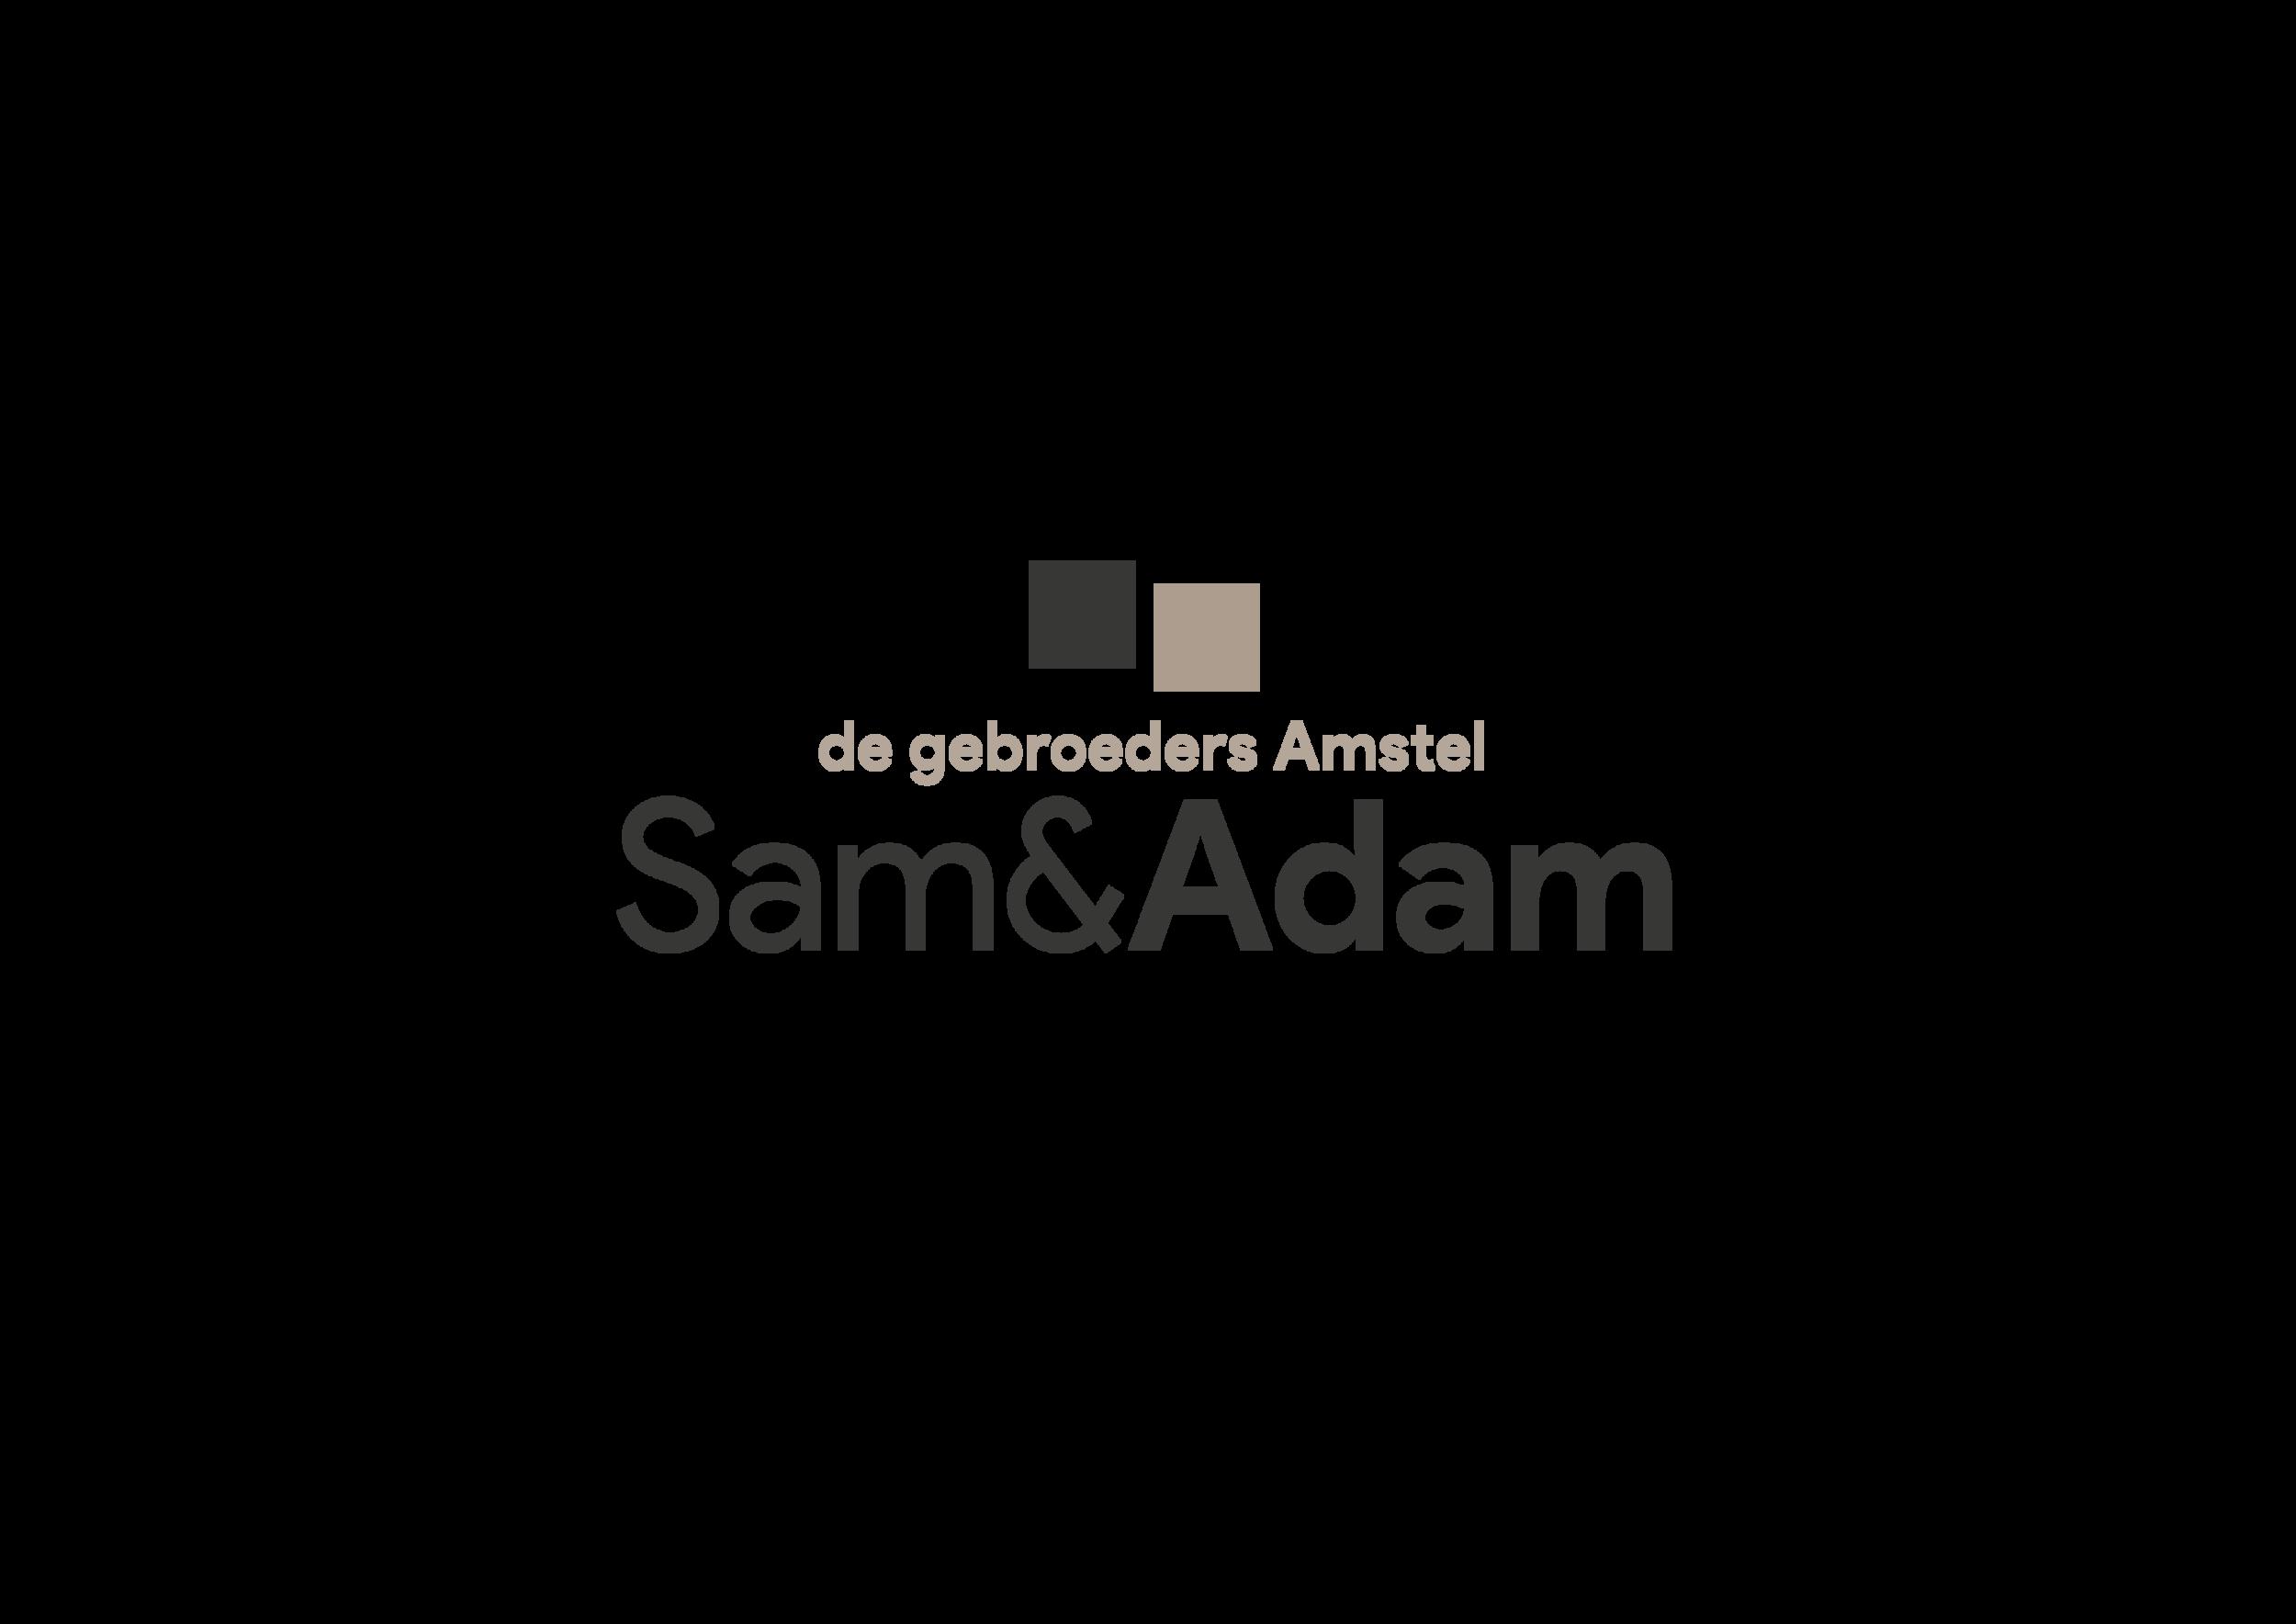 logo_Sam&Adam-02.png